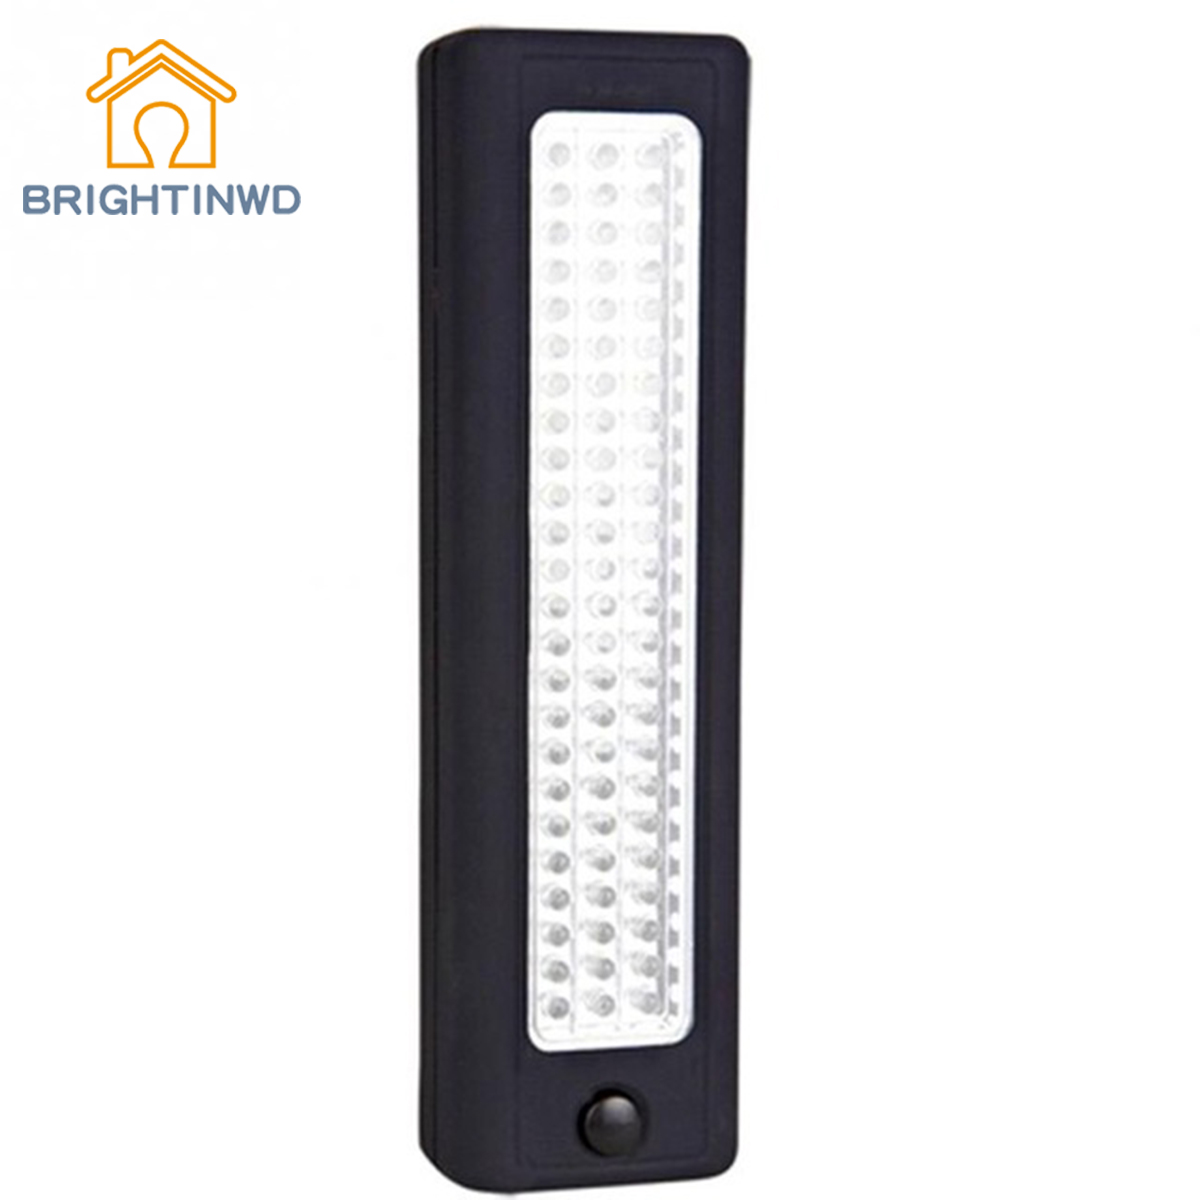 72 LED Bright Working Light Portable Outdoor Camping Light 6V 4.5W Overhaul Flashlight BRIGHTINWD